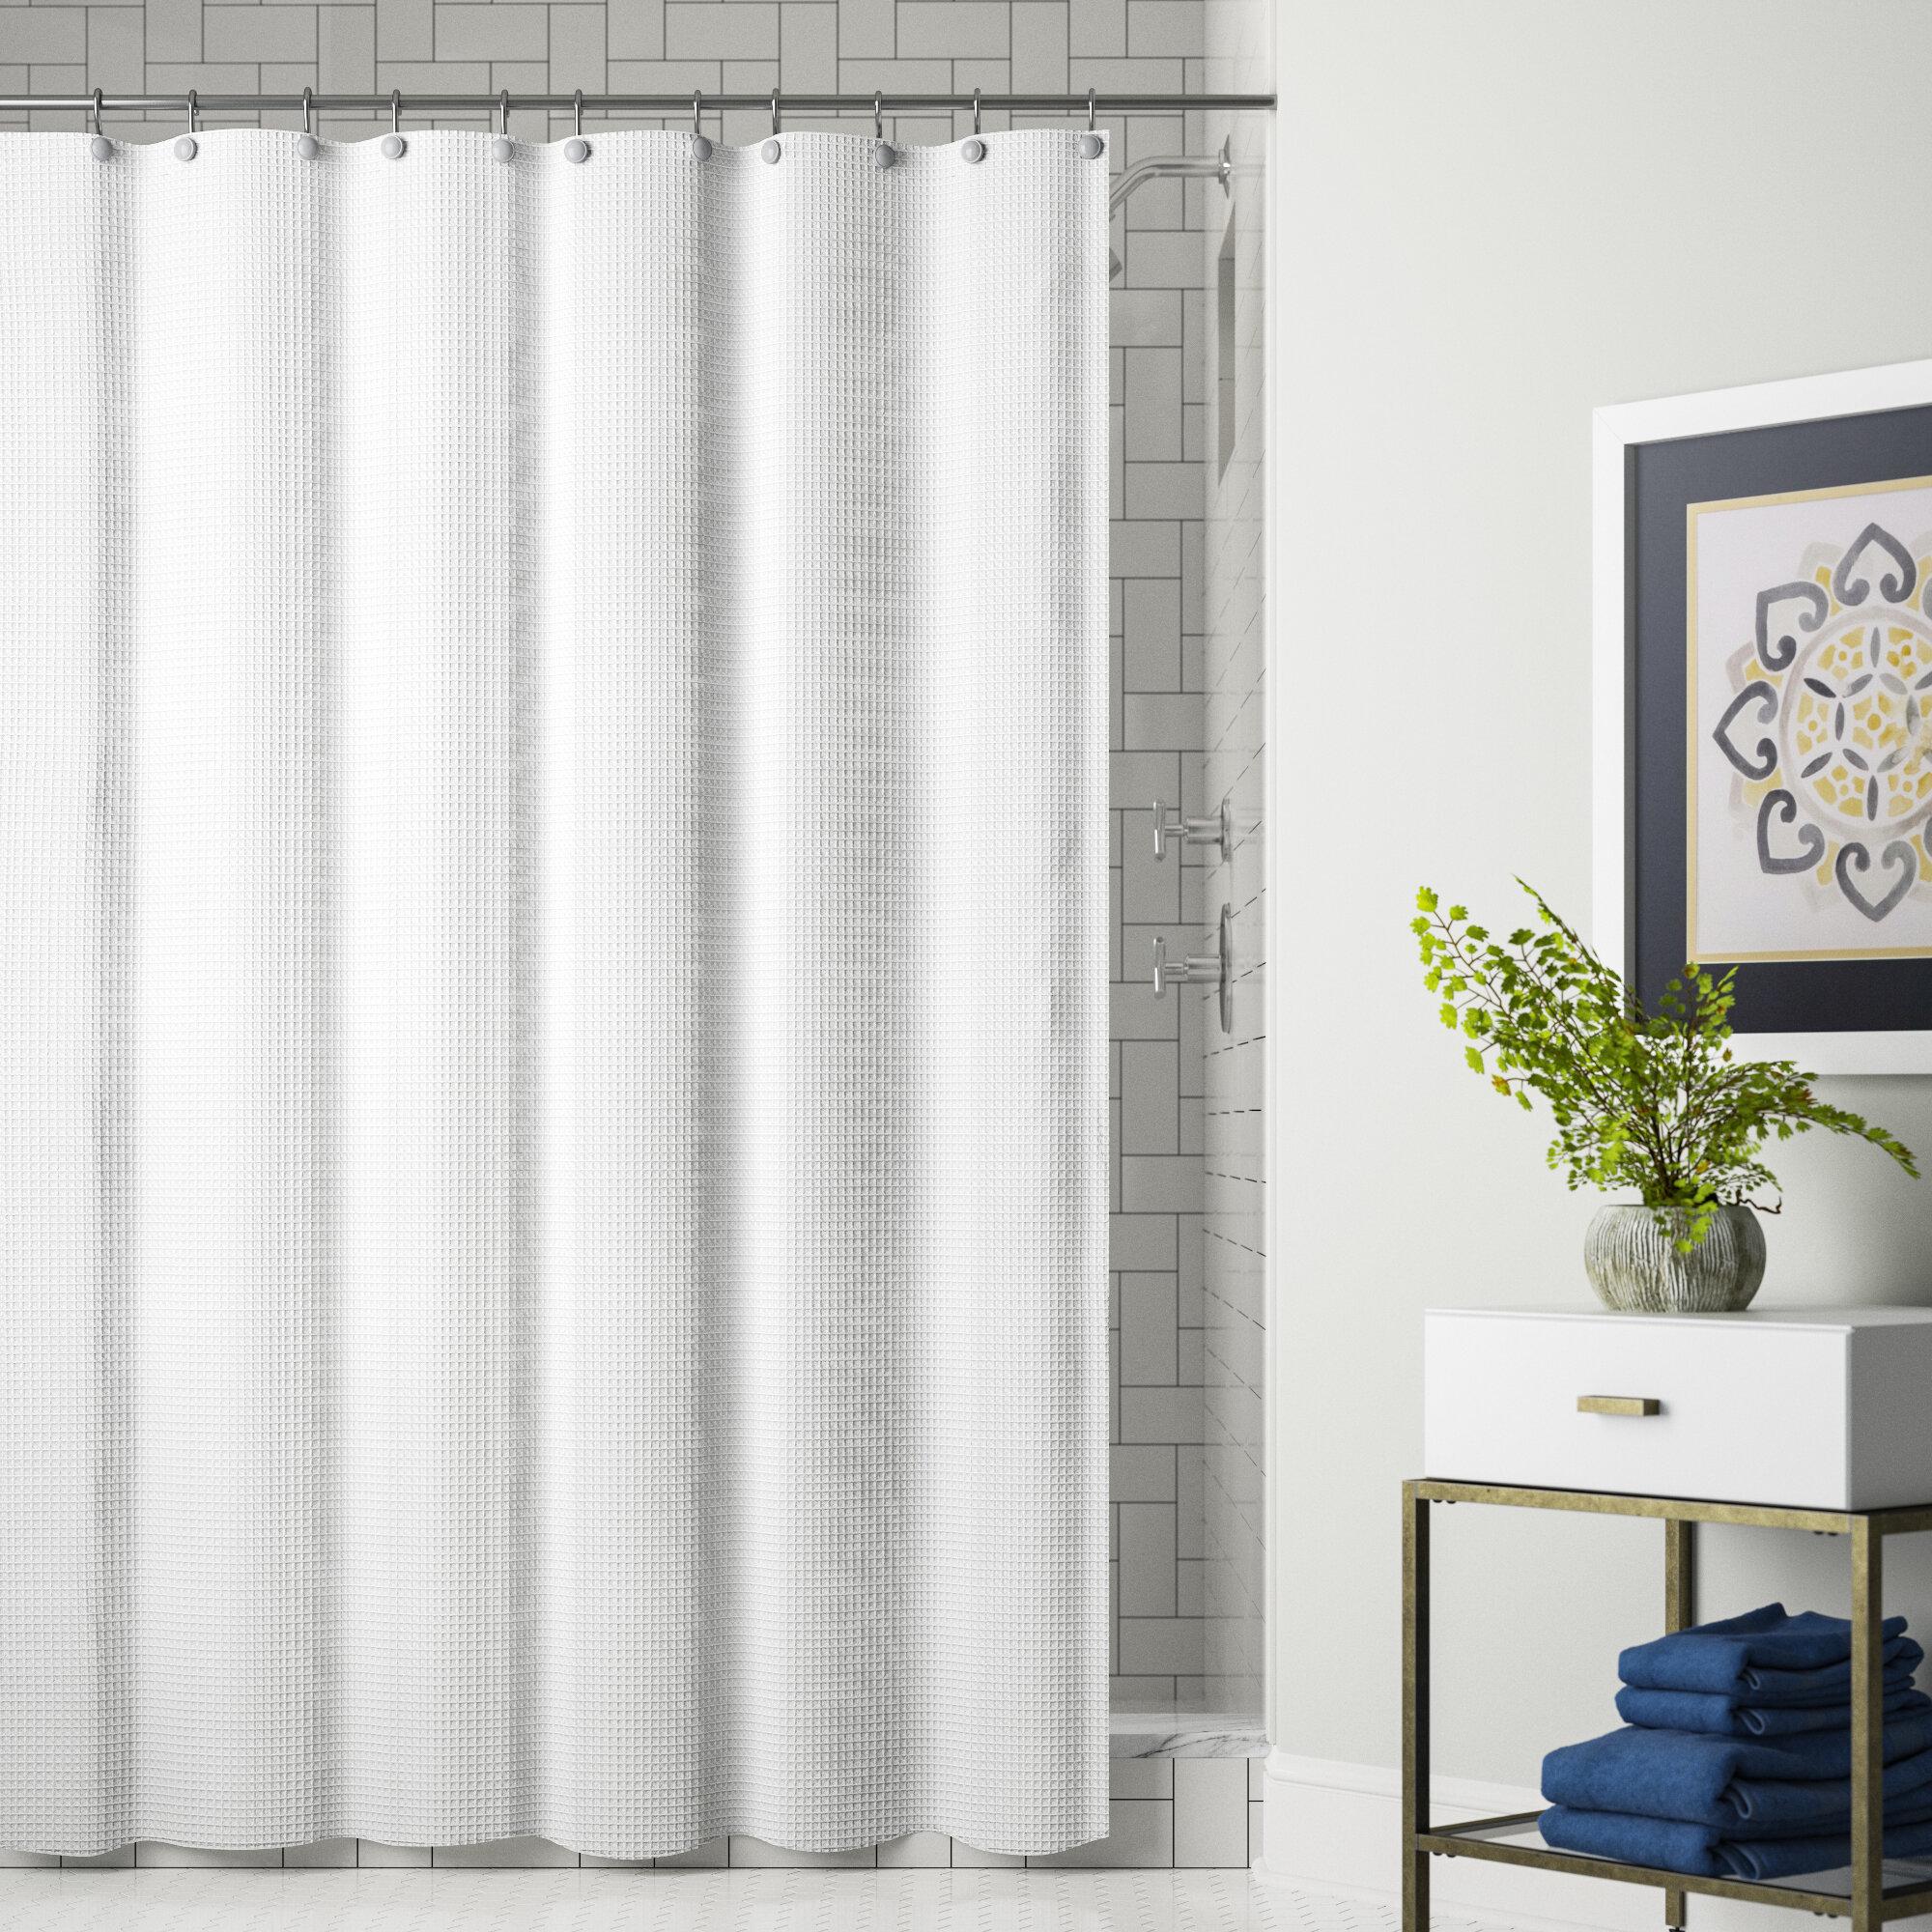 Symple Stuff Swilley Single Shower Curtain Reviews Wayfair